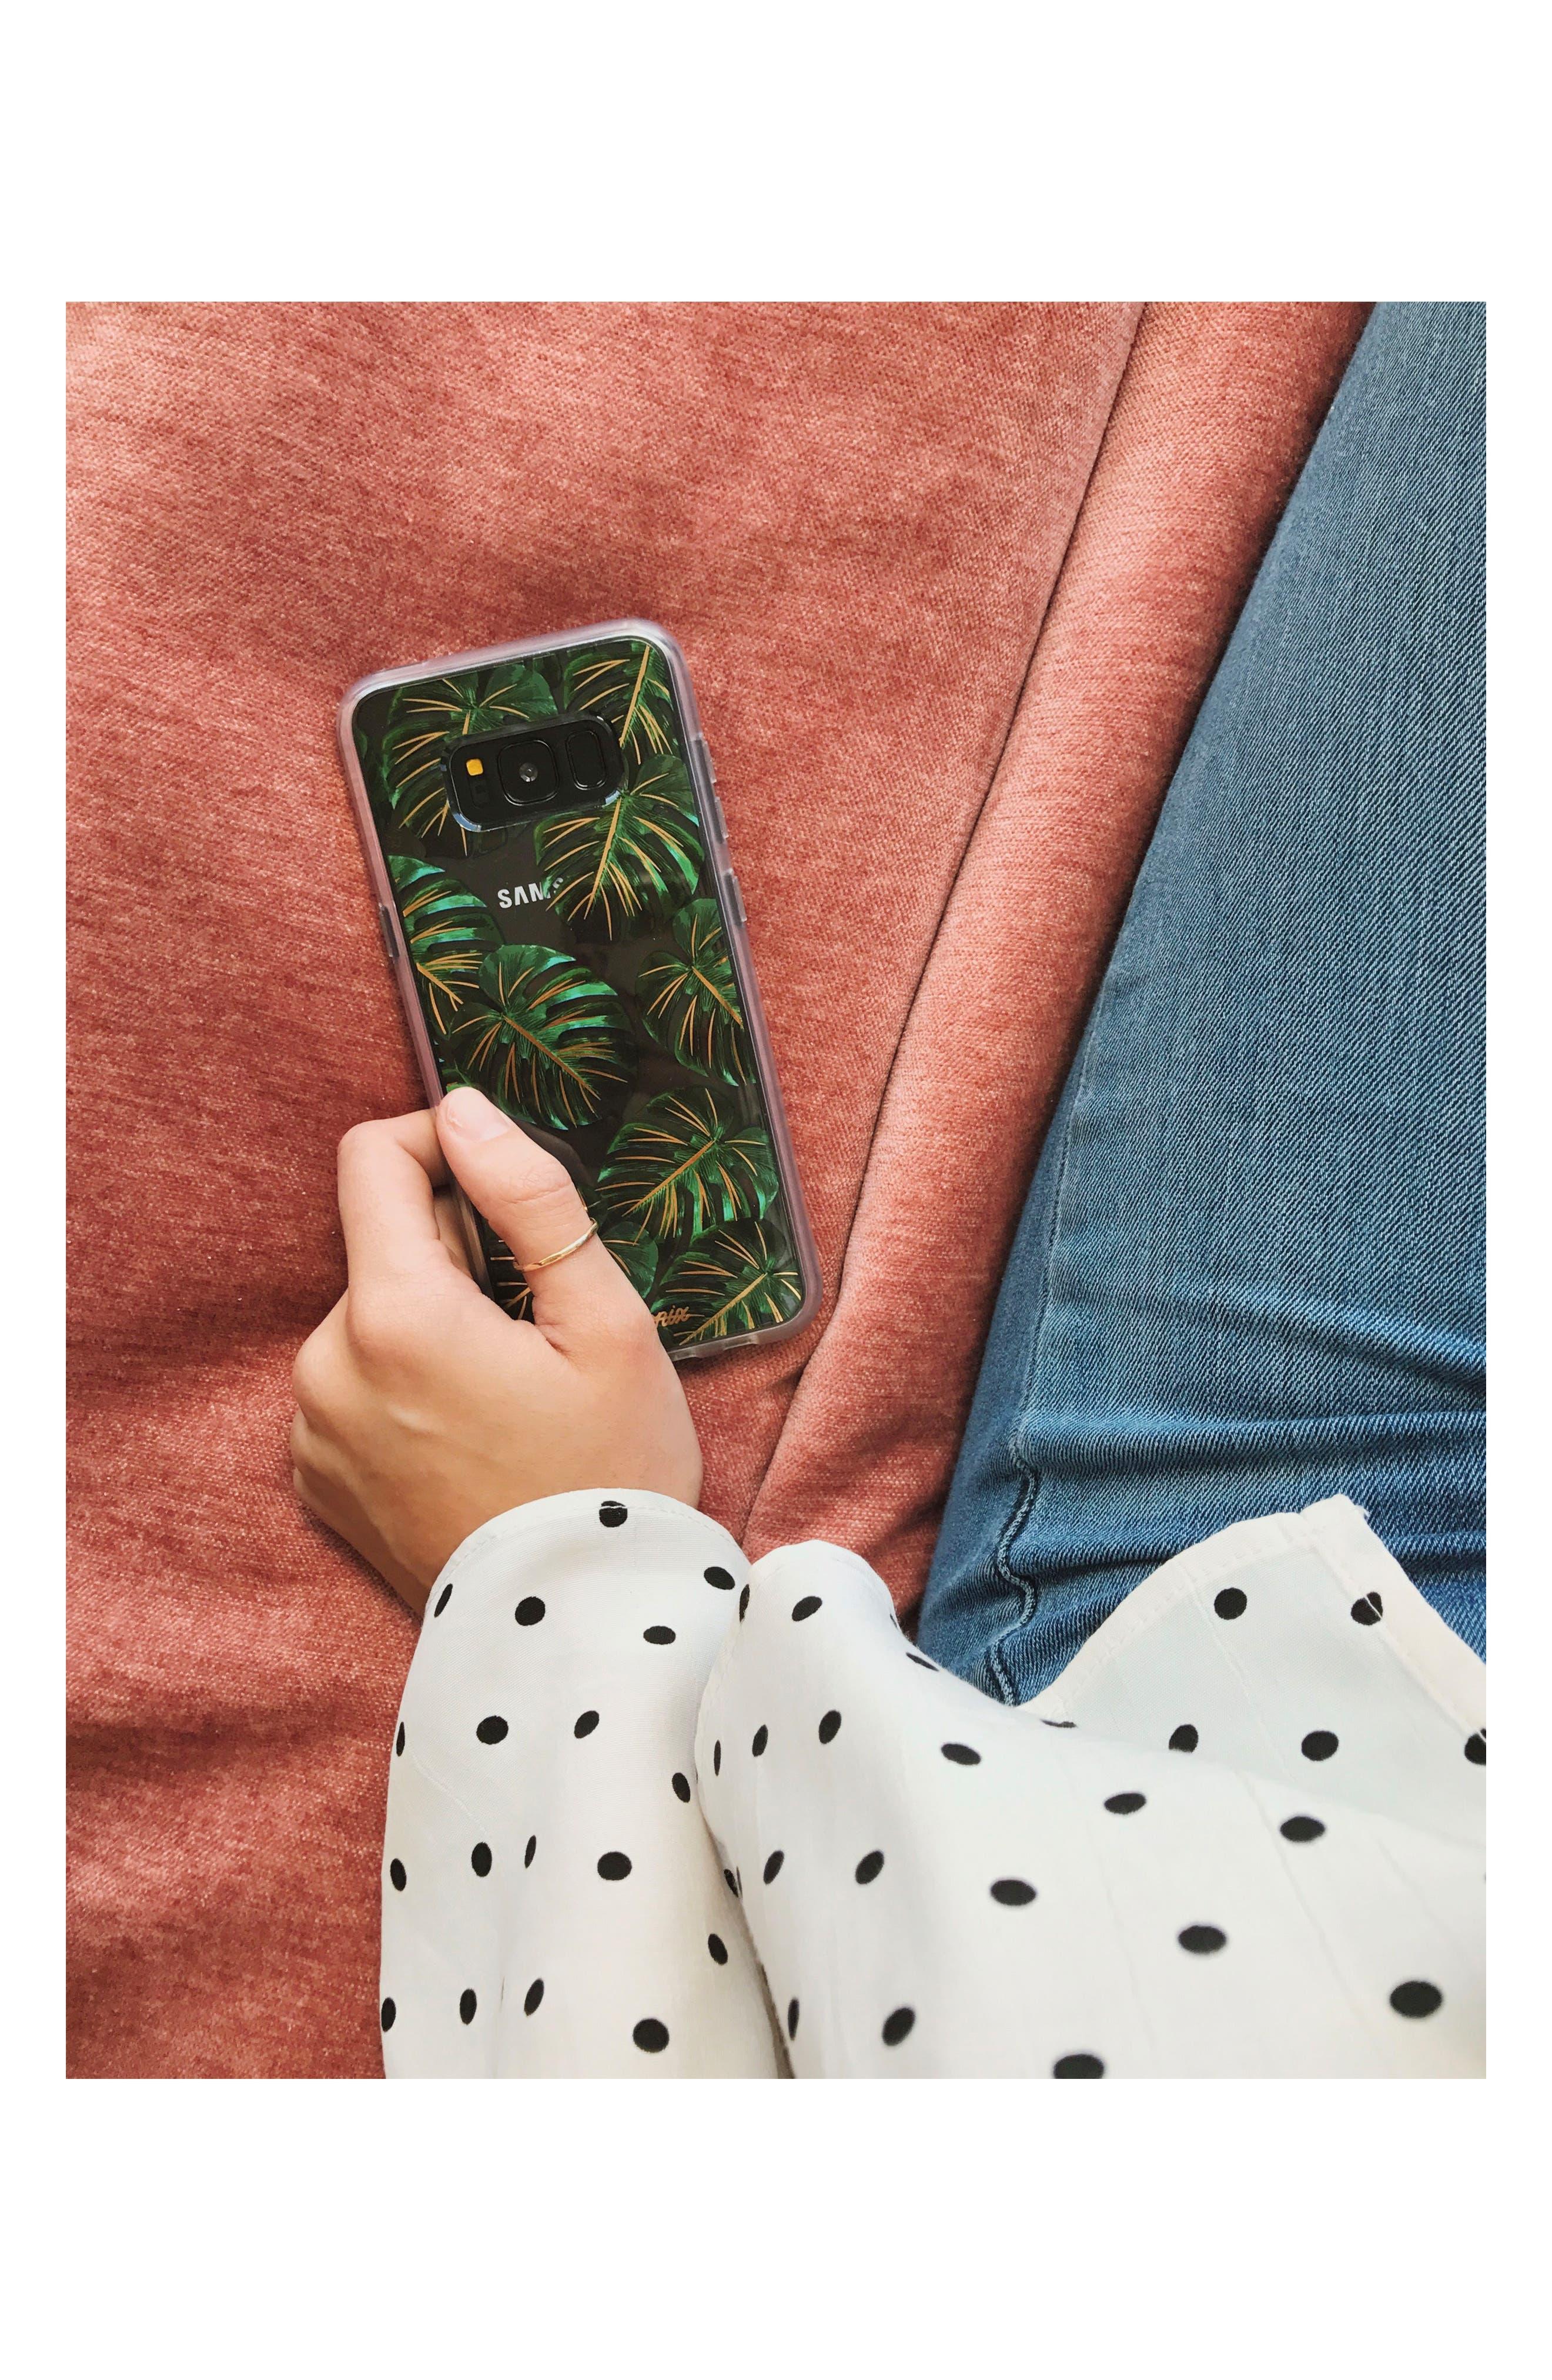 Tamarindo Samsung Galaxy S8 & Galaxy S8 Plus Case,                             Alternate thumbnail 6, color,                             300